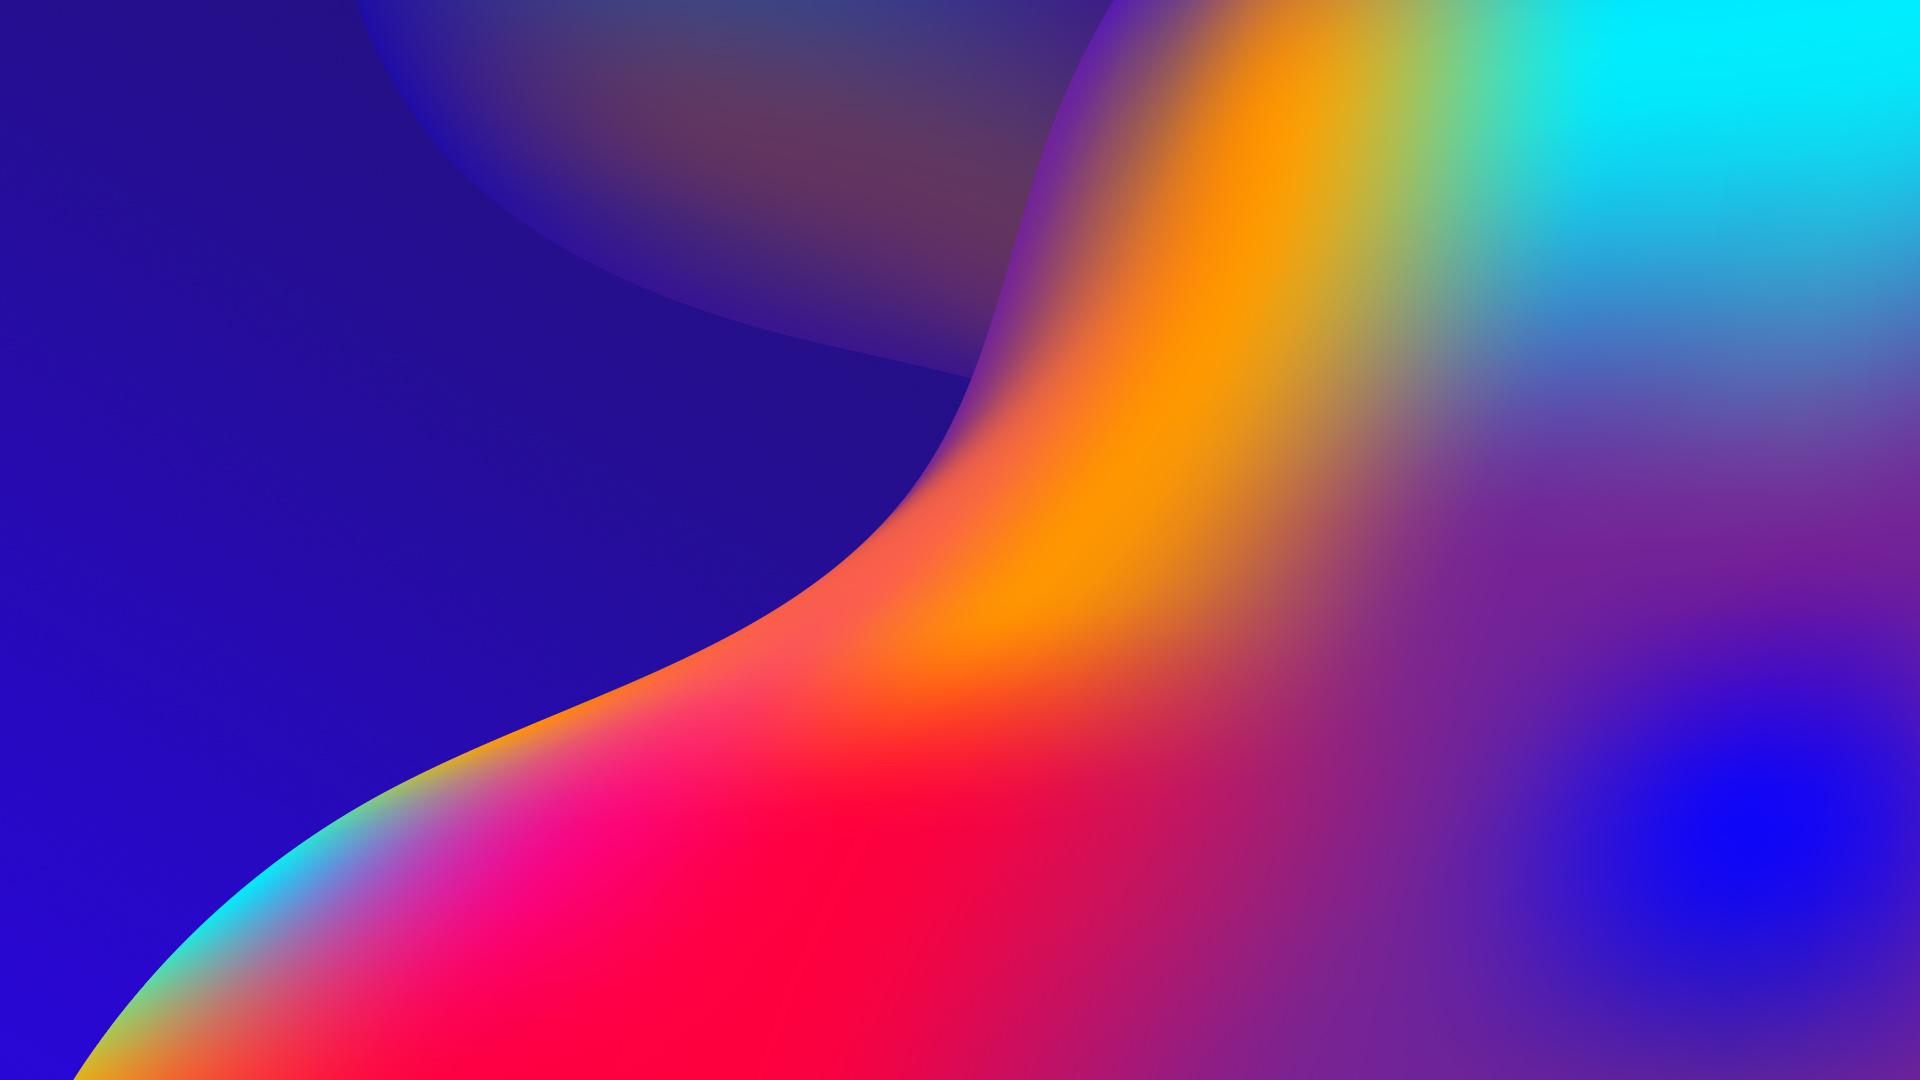 3d Bubbles Wallpaper Desktop Neon Gradient Wallpapers Hd Wallpapers Id 24777